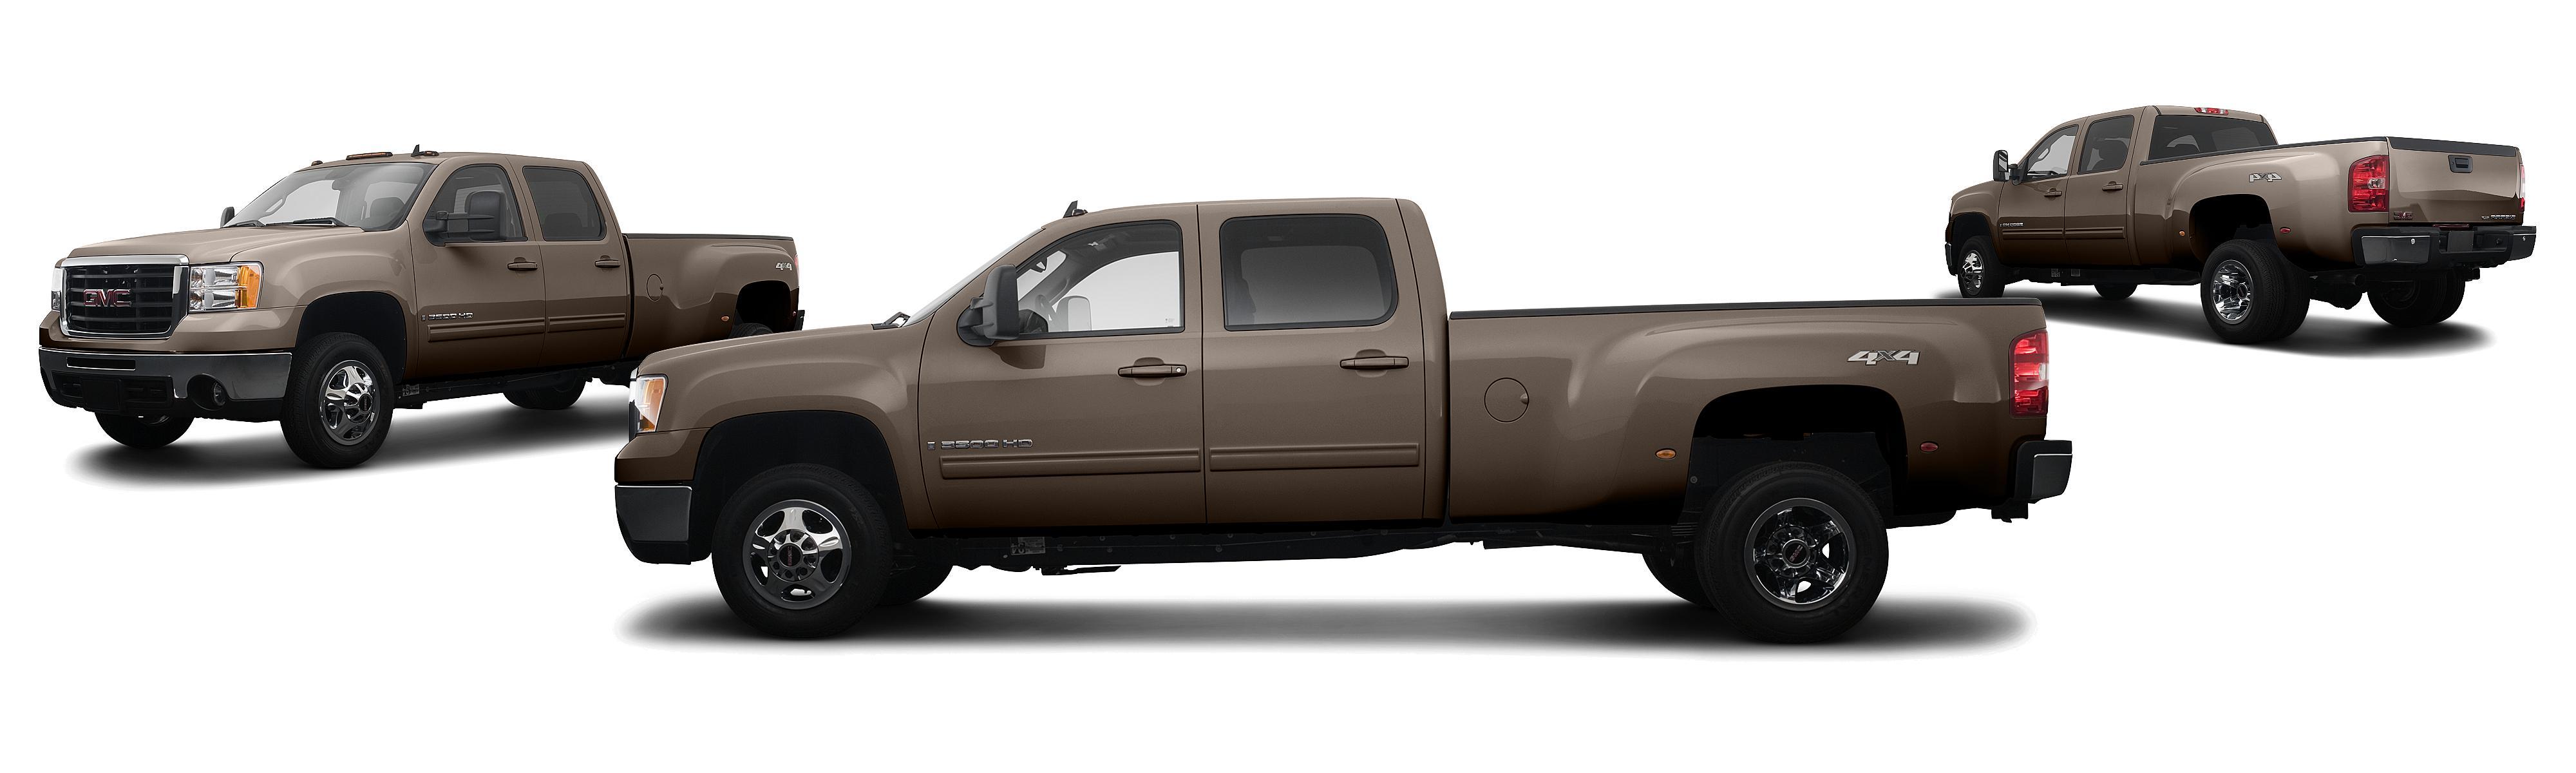 of sierra future truck gmc pickup tailgate denali the